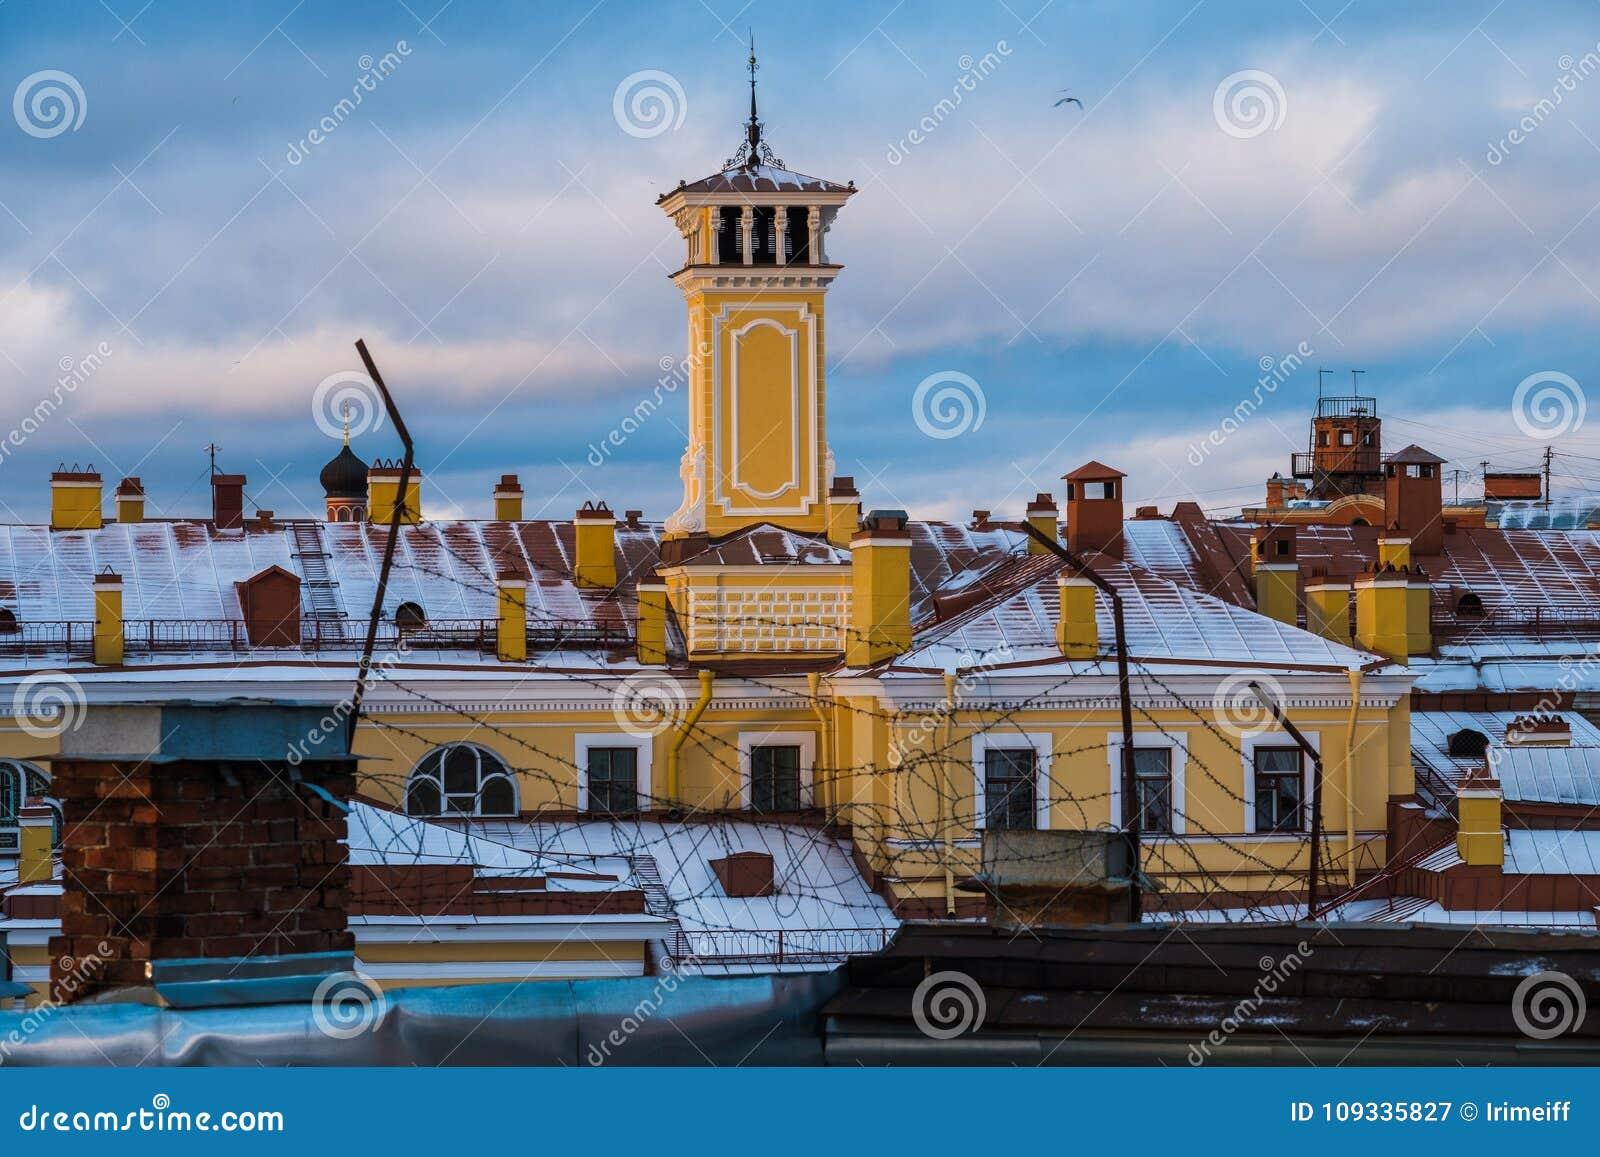 Paesaggio di inverno di Sankt-Peterburg